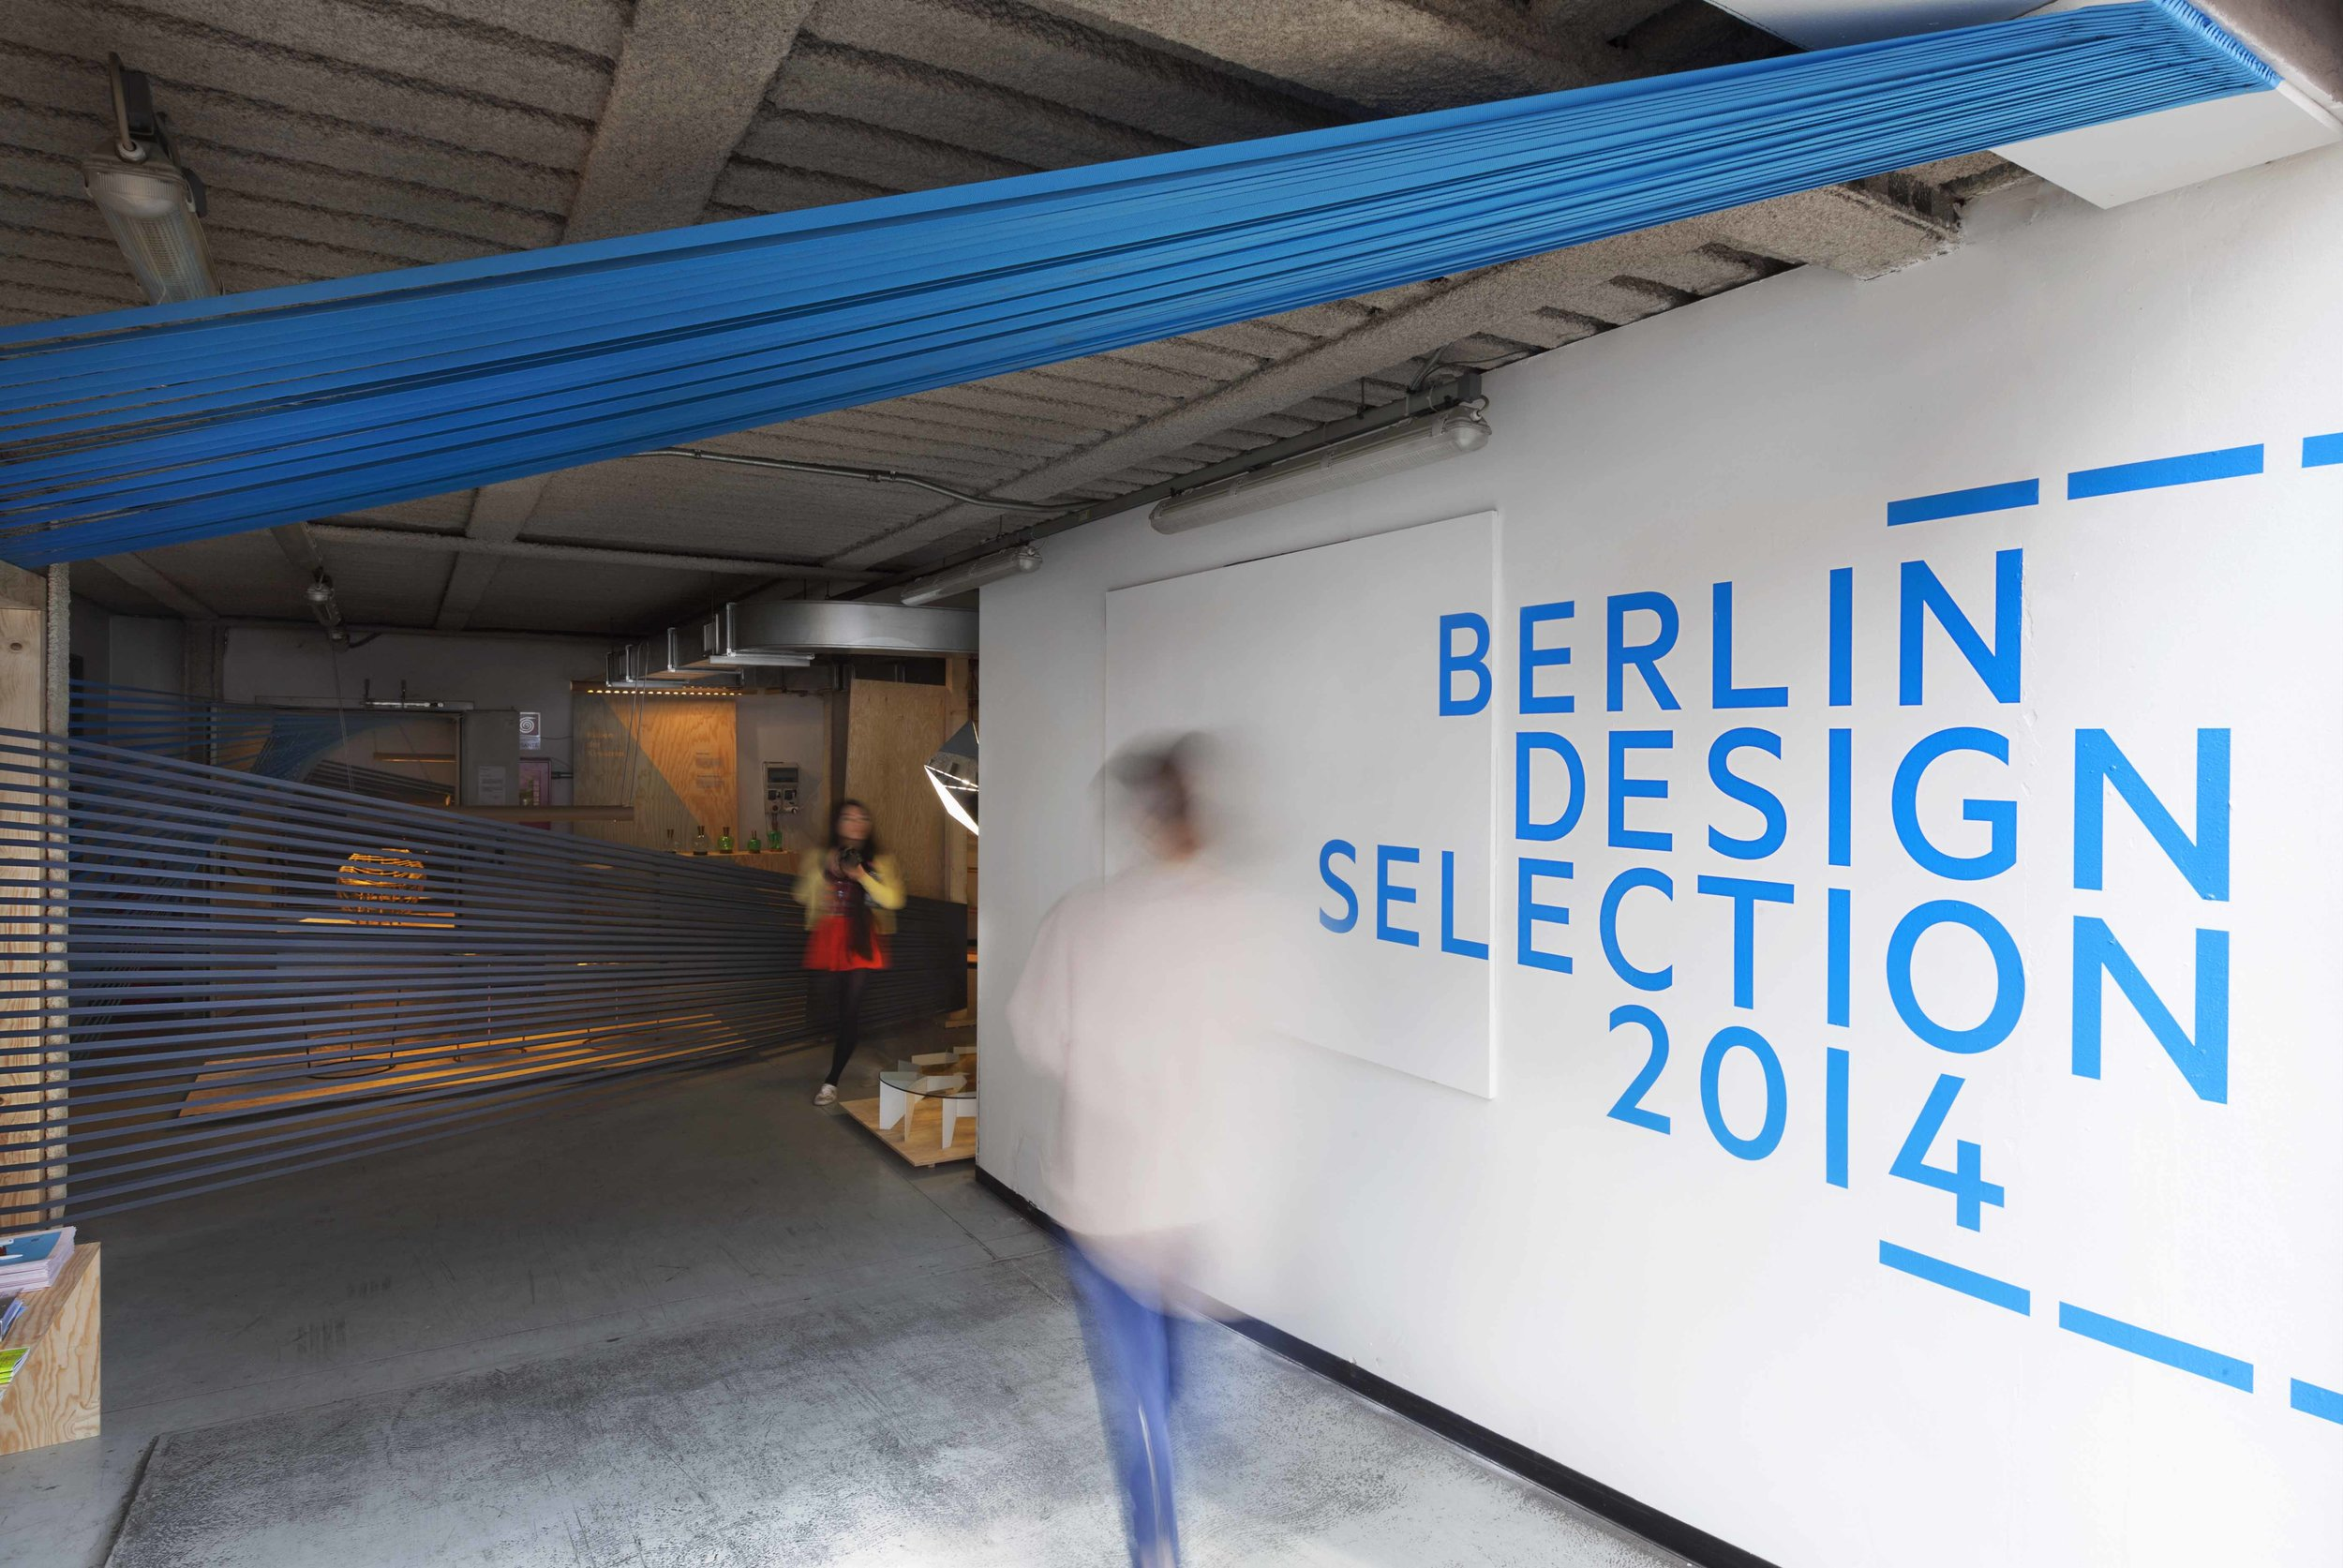 berlin-design-selection-milan_tradefair-exhibition-design_coordination-berlin__01.jpg